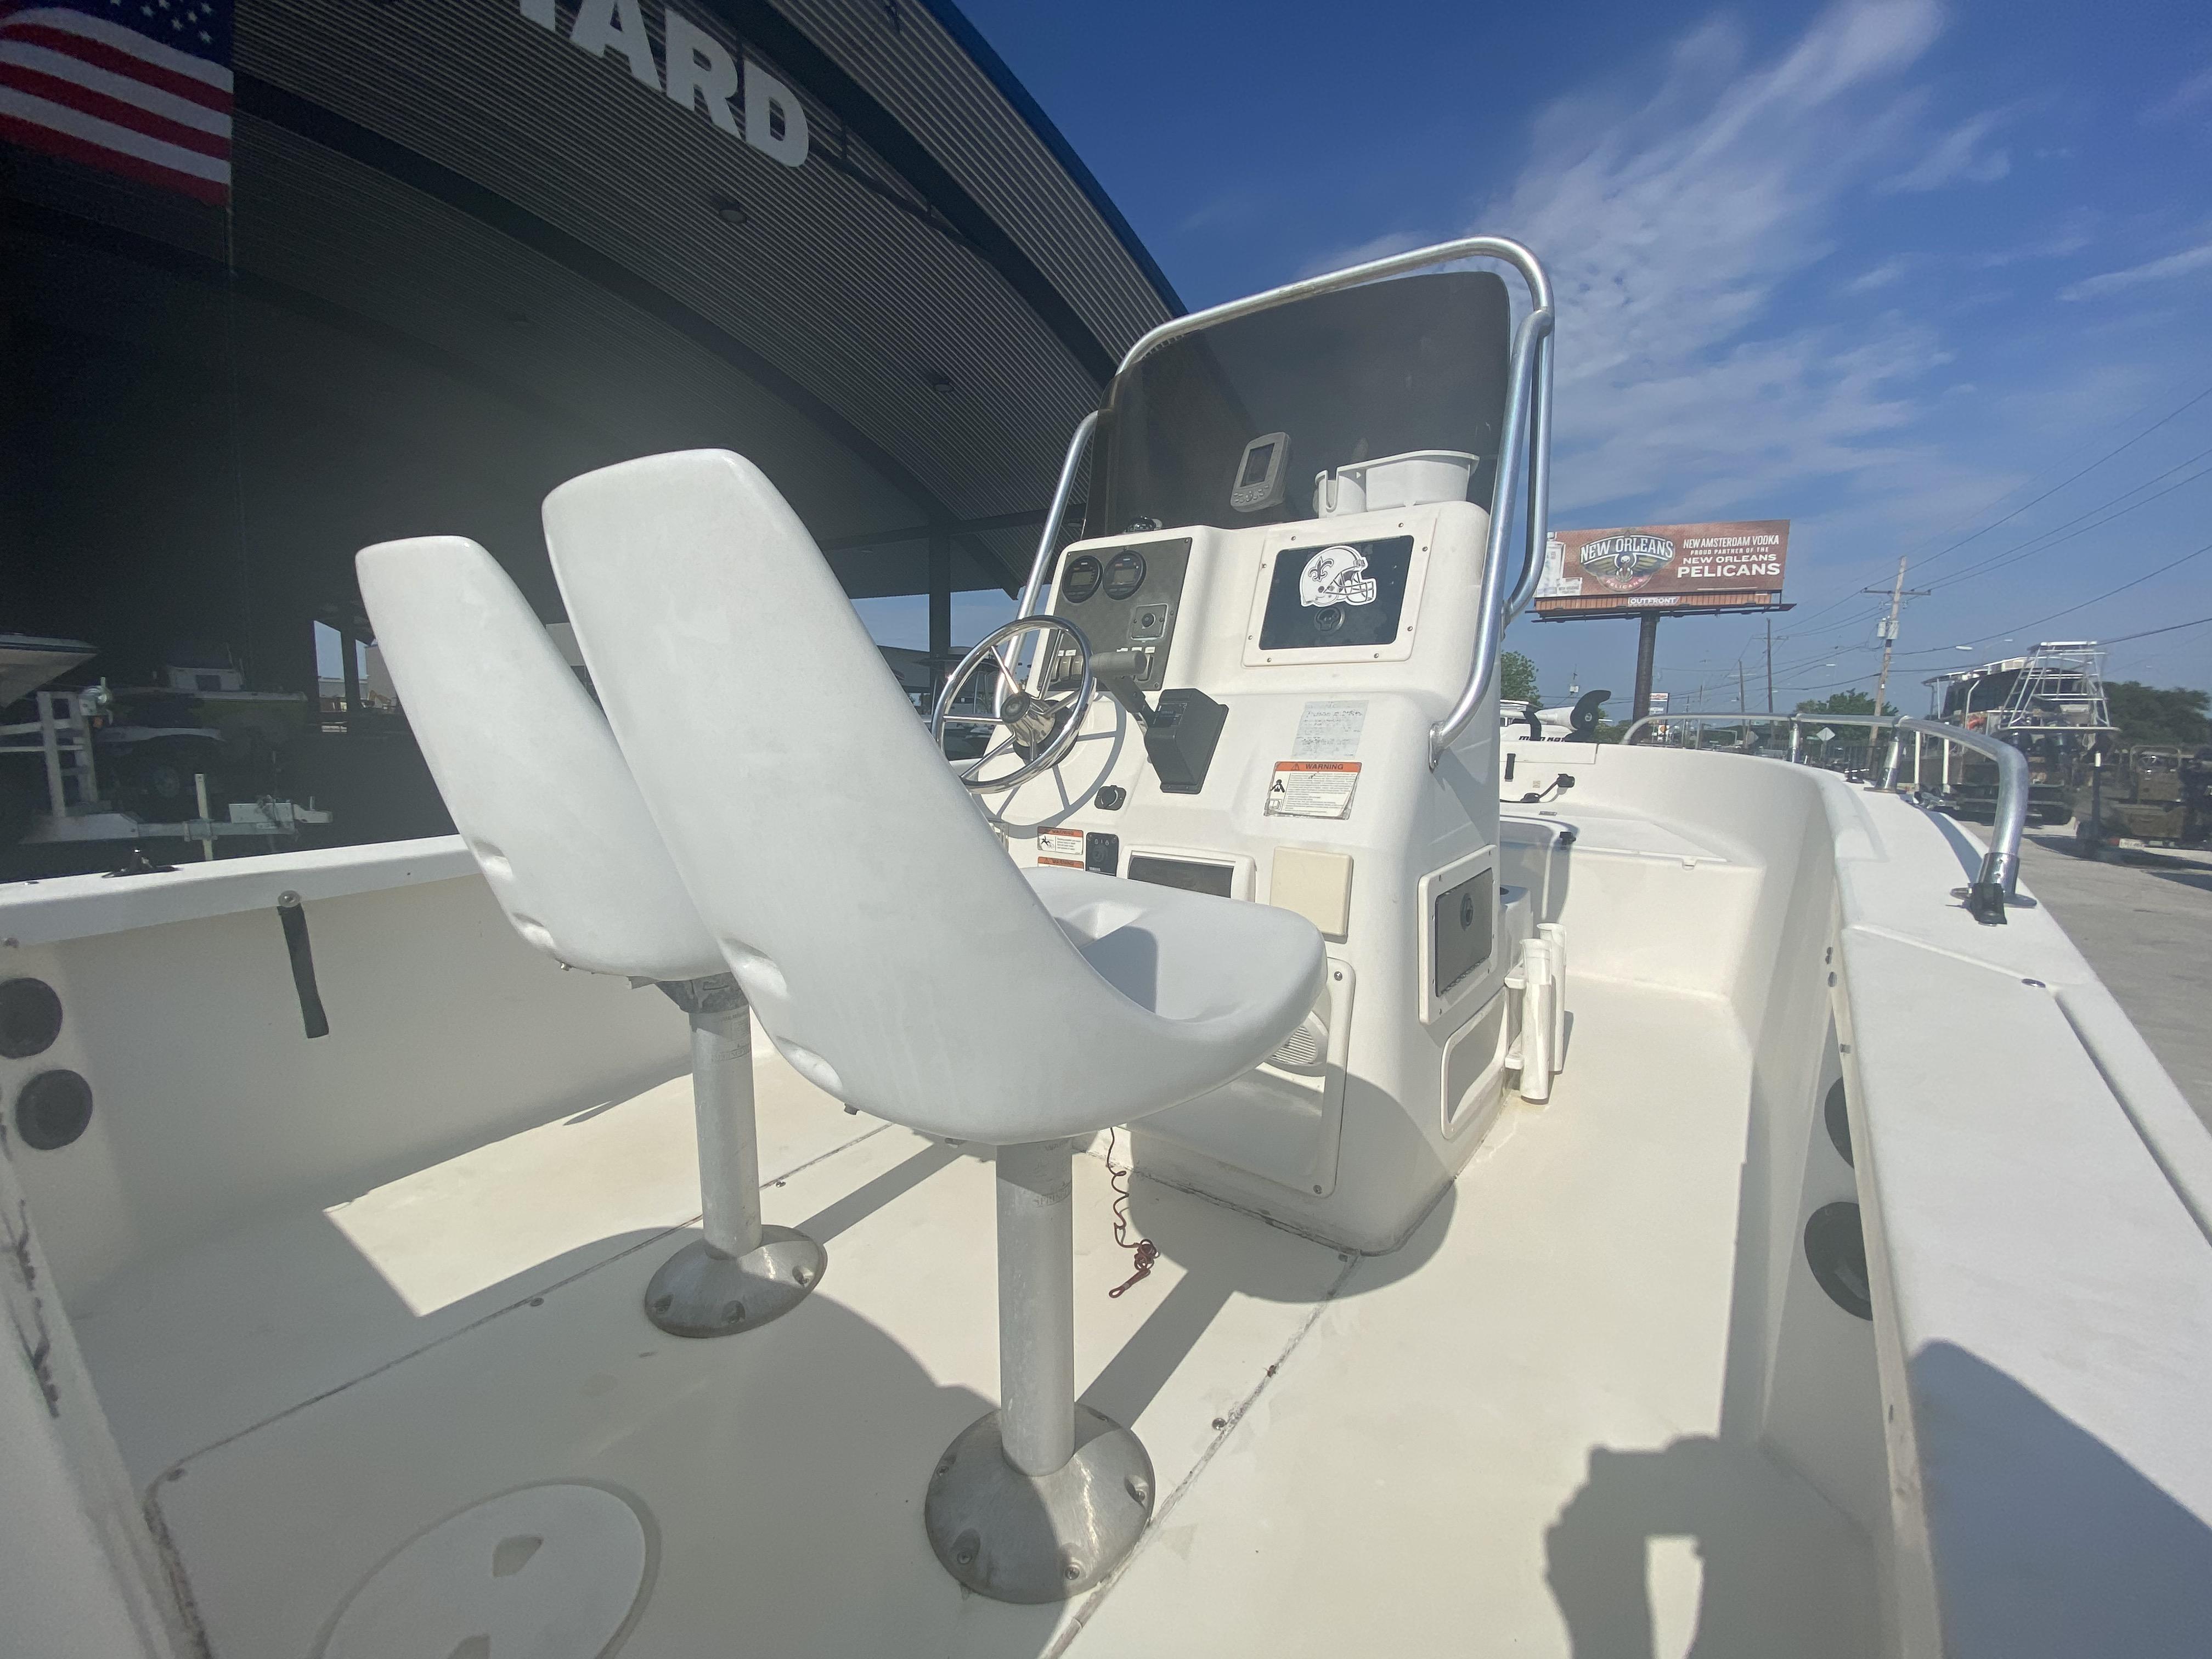 2004 Seaswirl boat for sale, model of the boat is 186 Striper & Image # 7 of 12